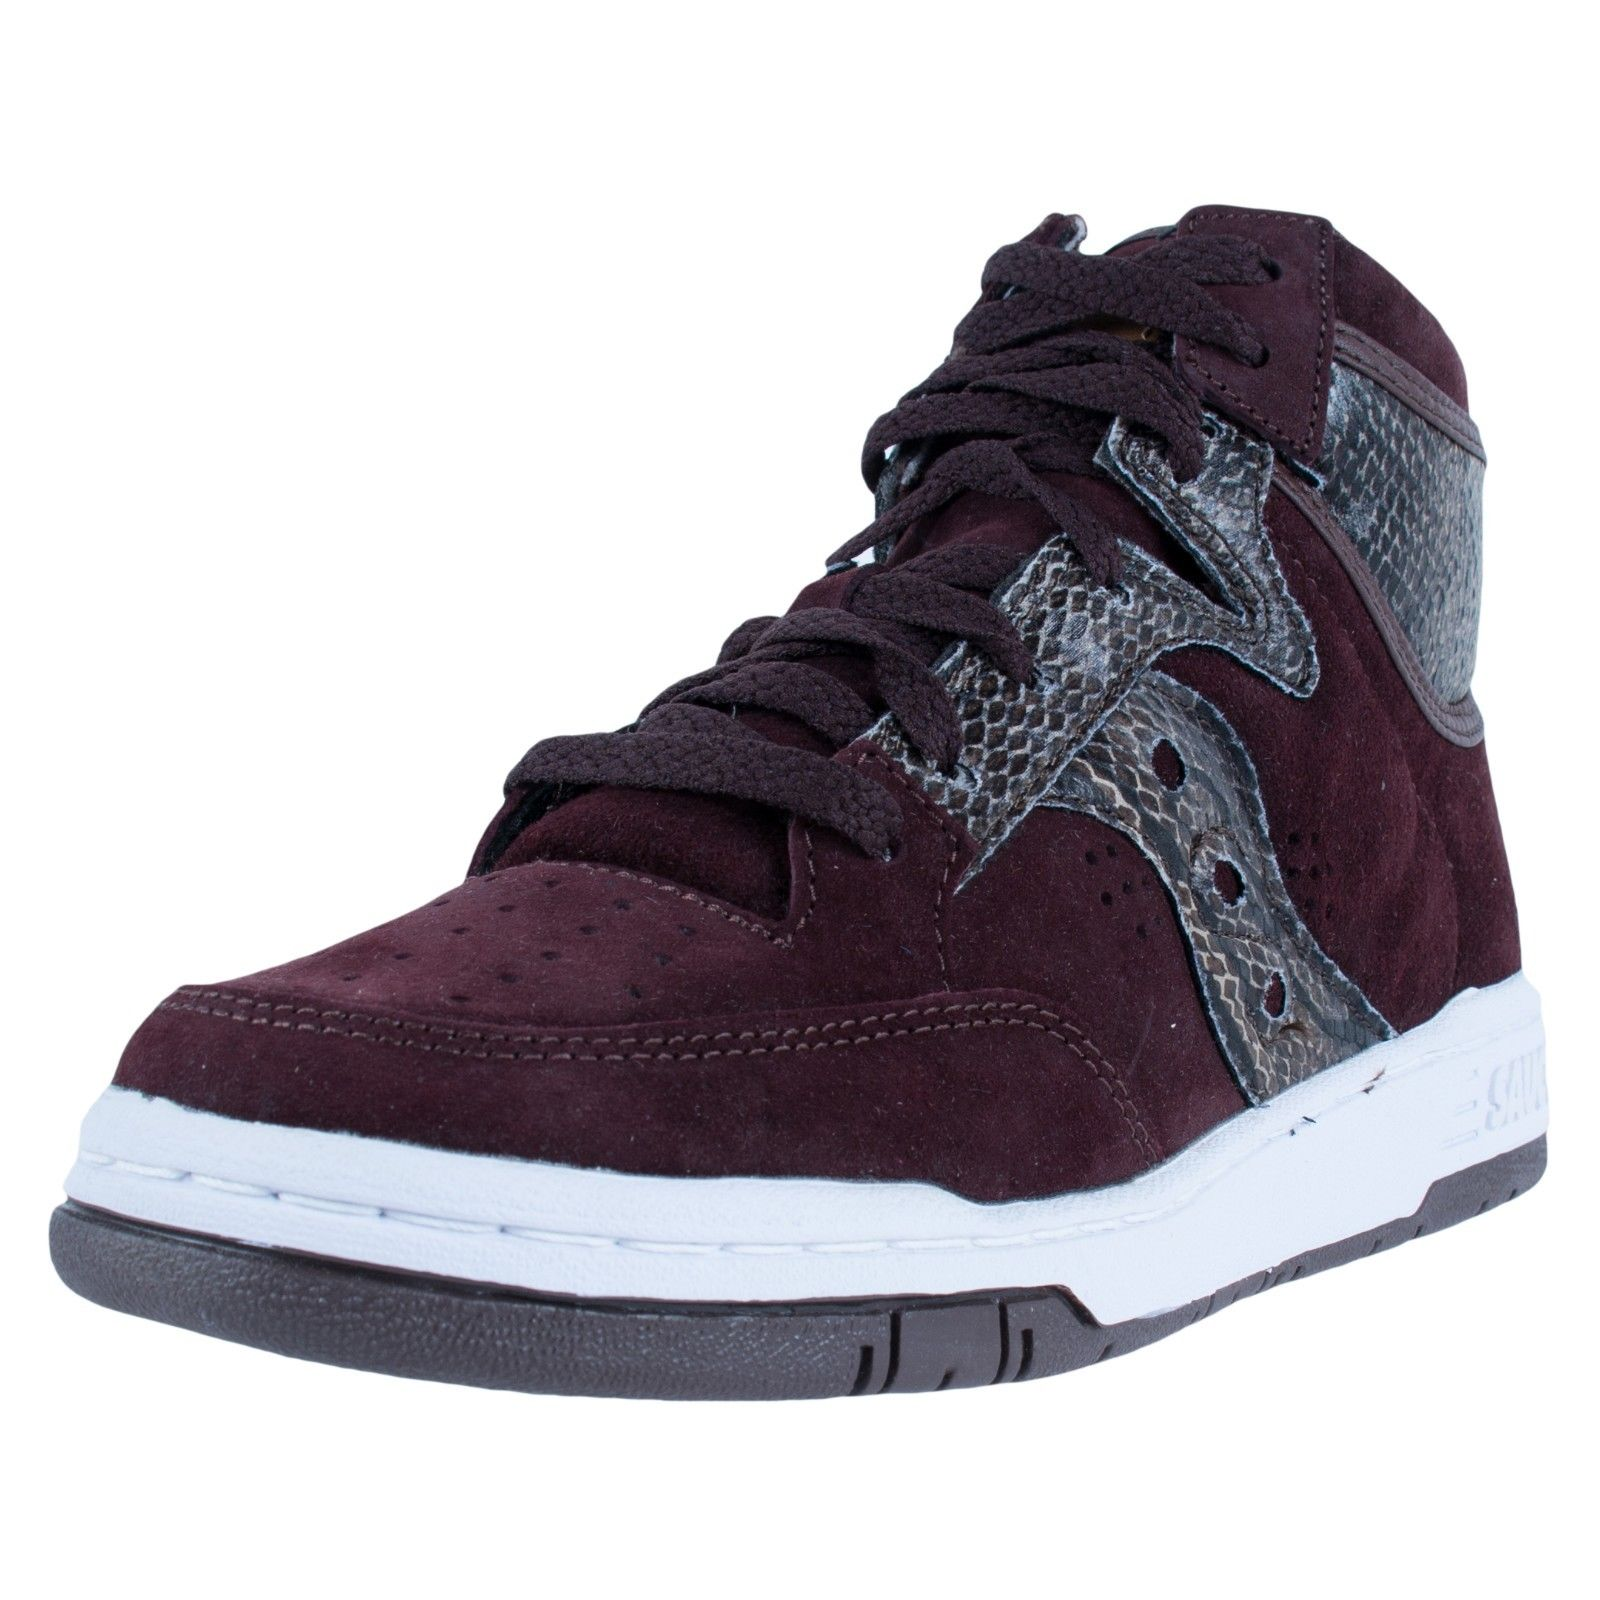 Saucony Hangtime Hi Brown Packer Shoes 70127-3 Men/'s SZ 13